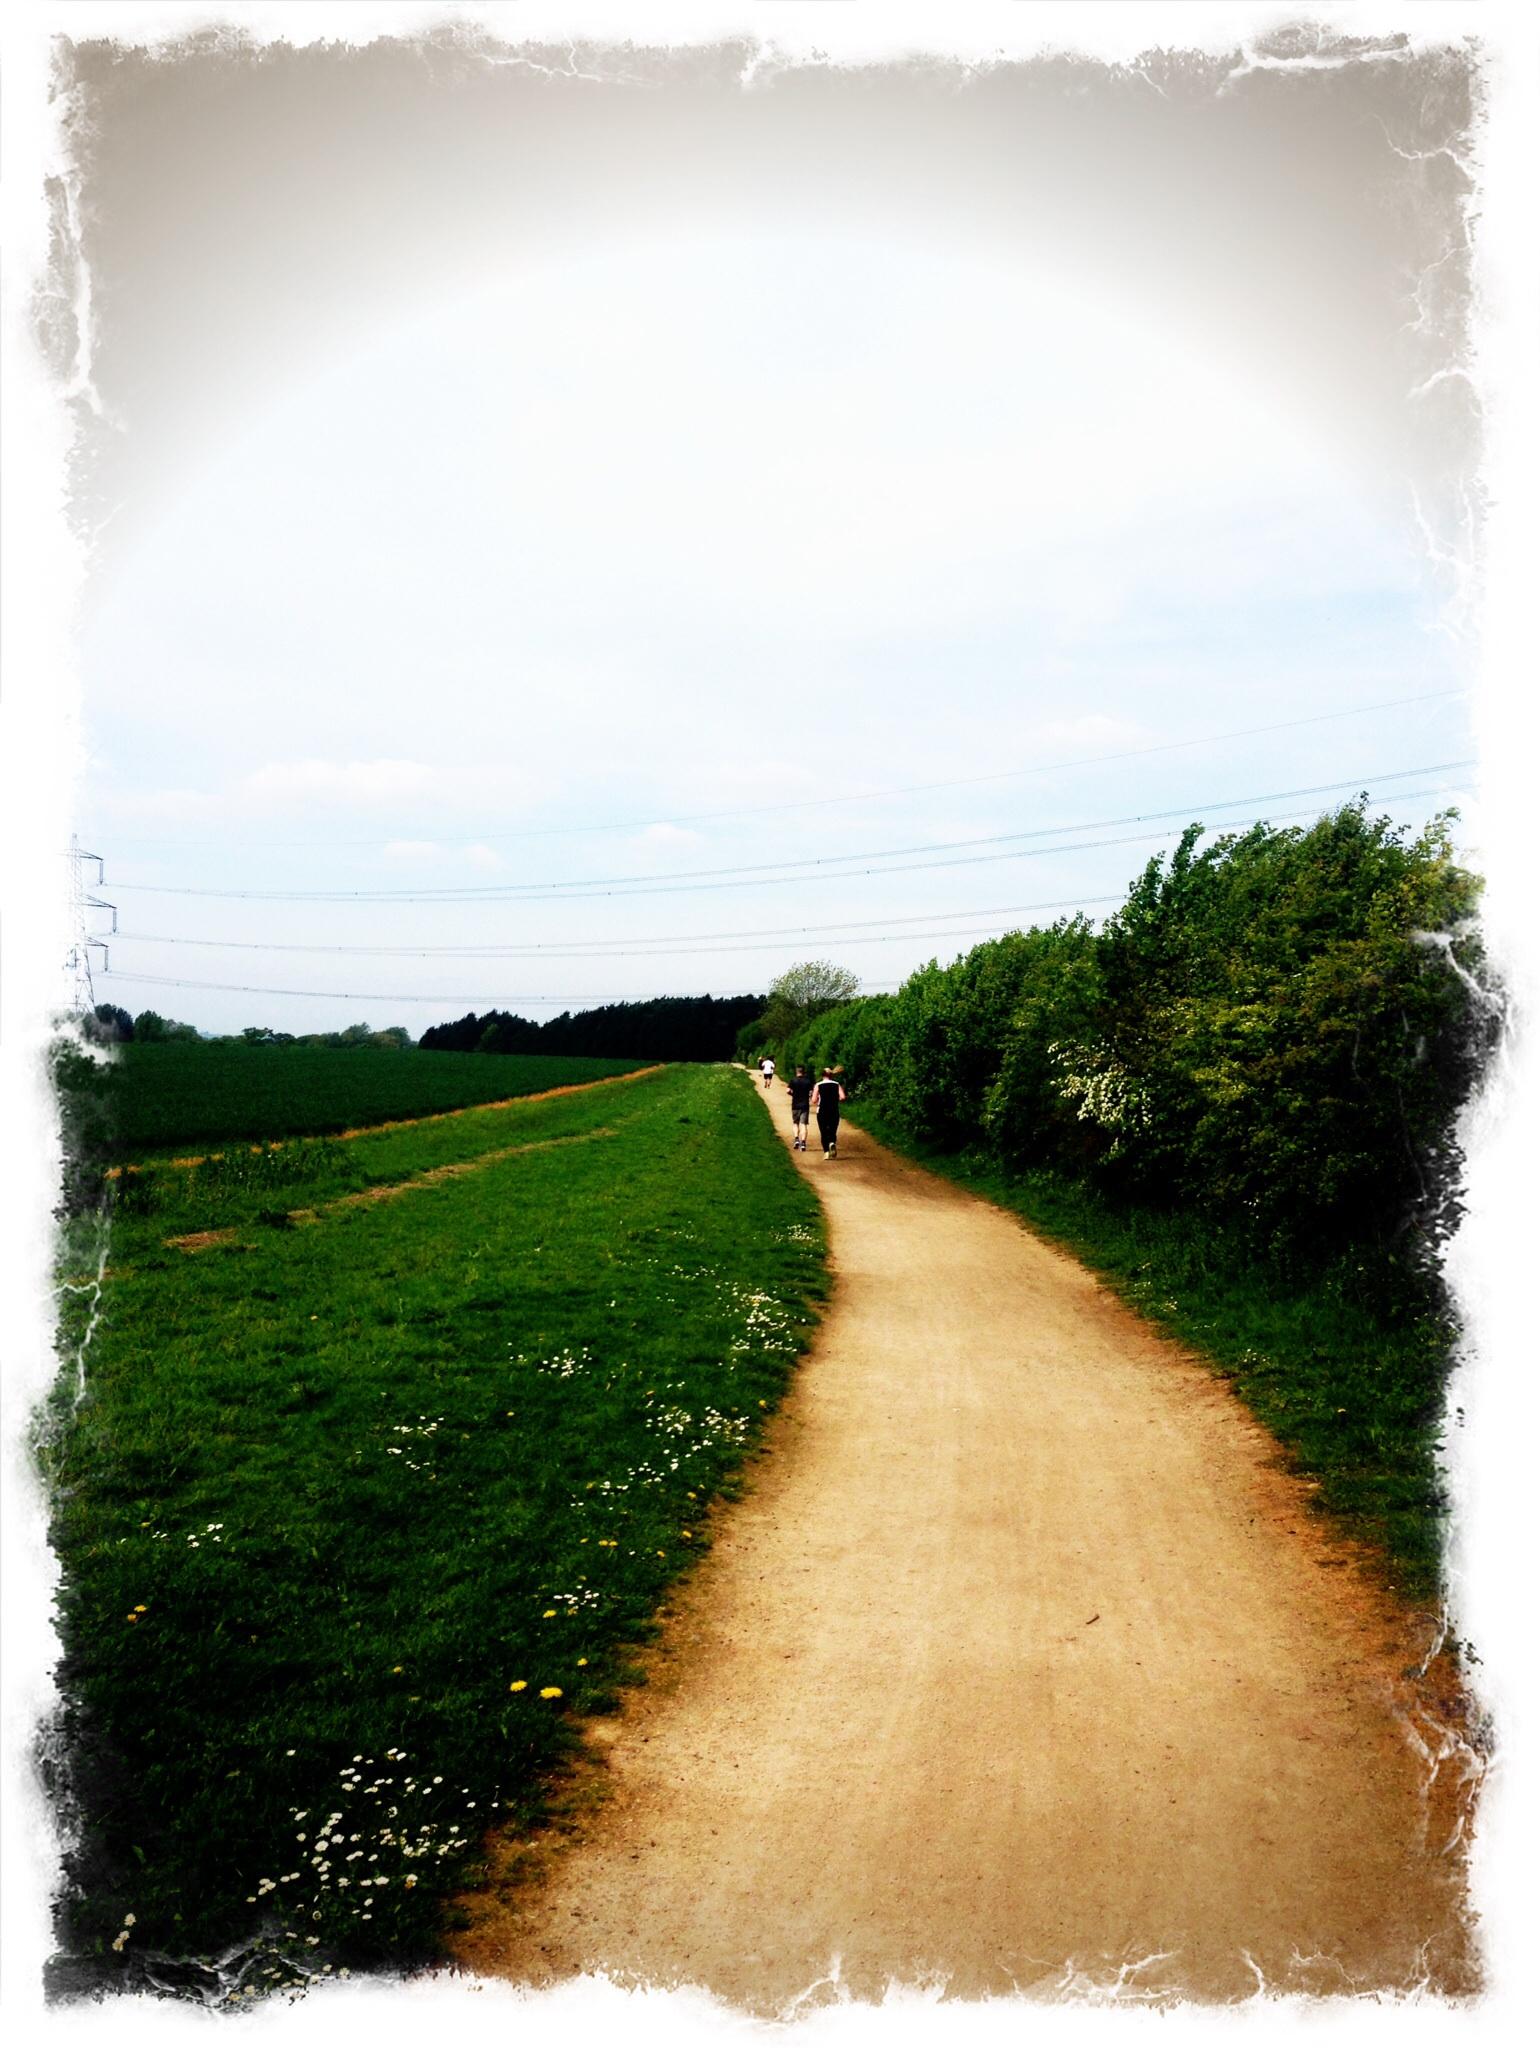 Race report: Letchworth Greenway Challenge Half Marathon